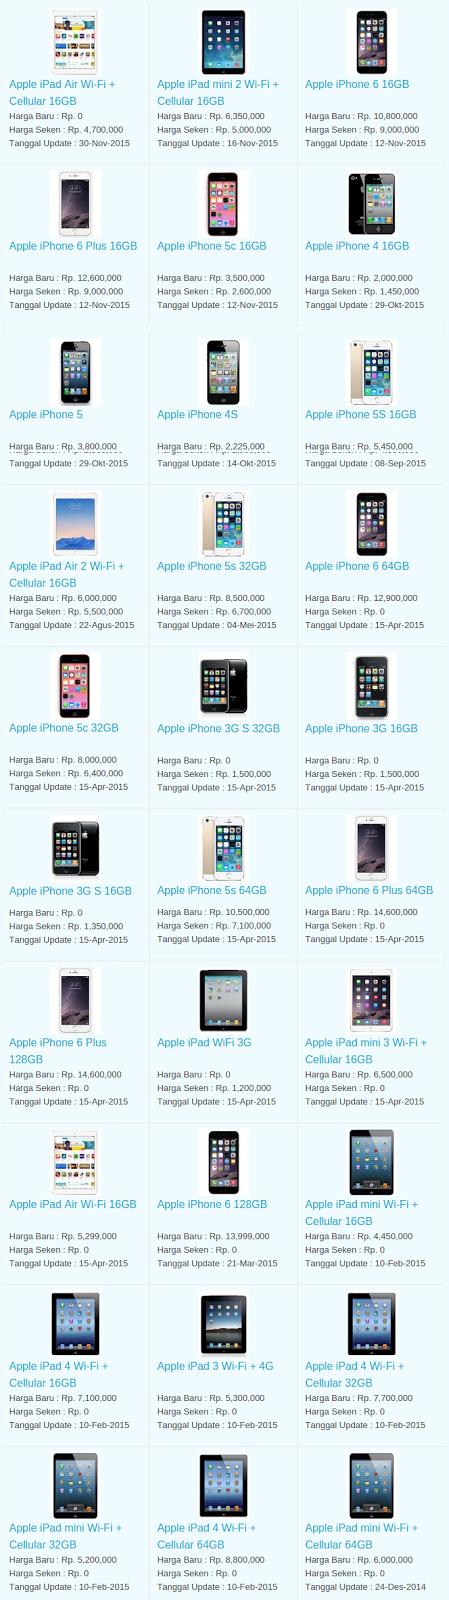 Daftar Harga Hp Apple Desember 2015